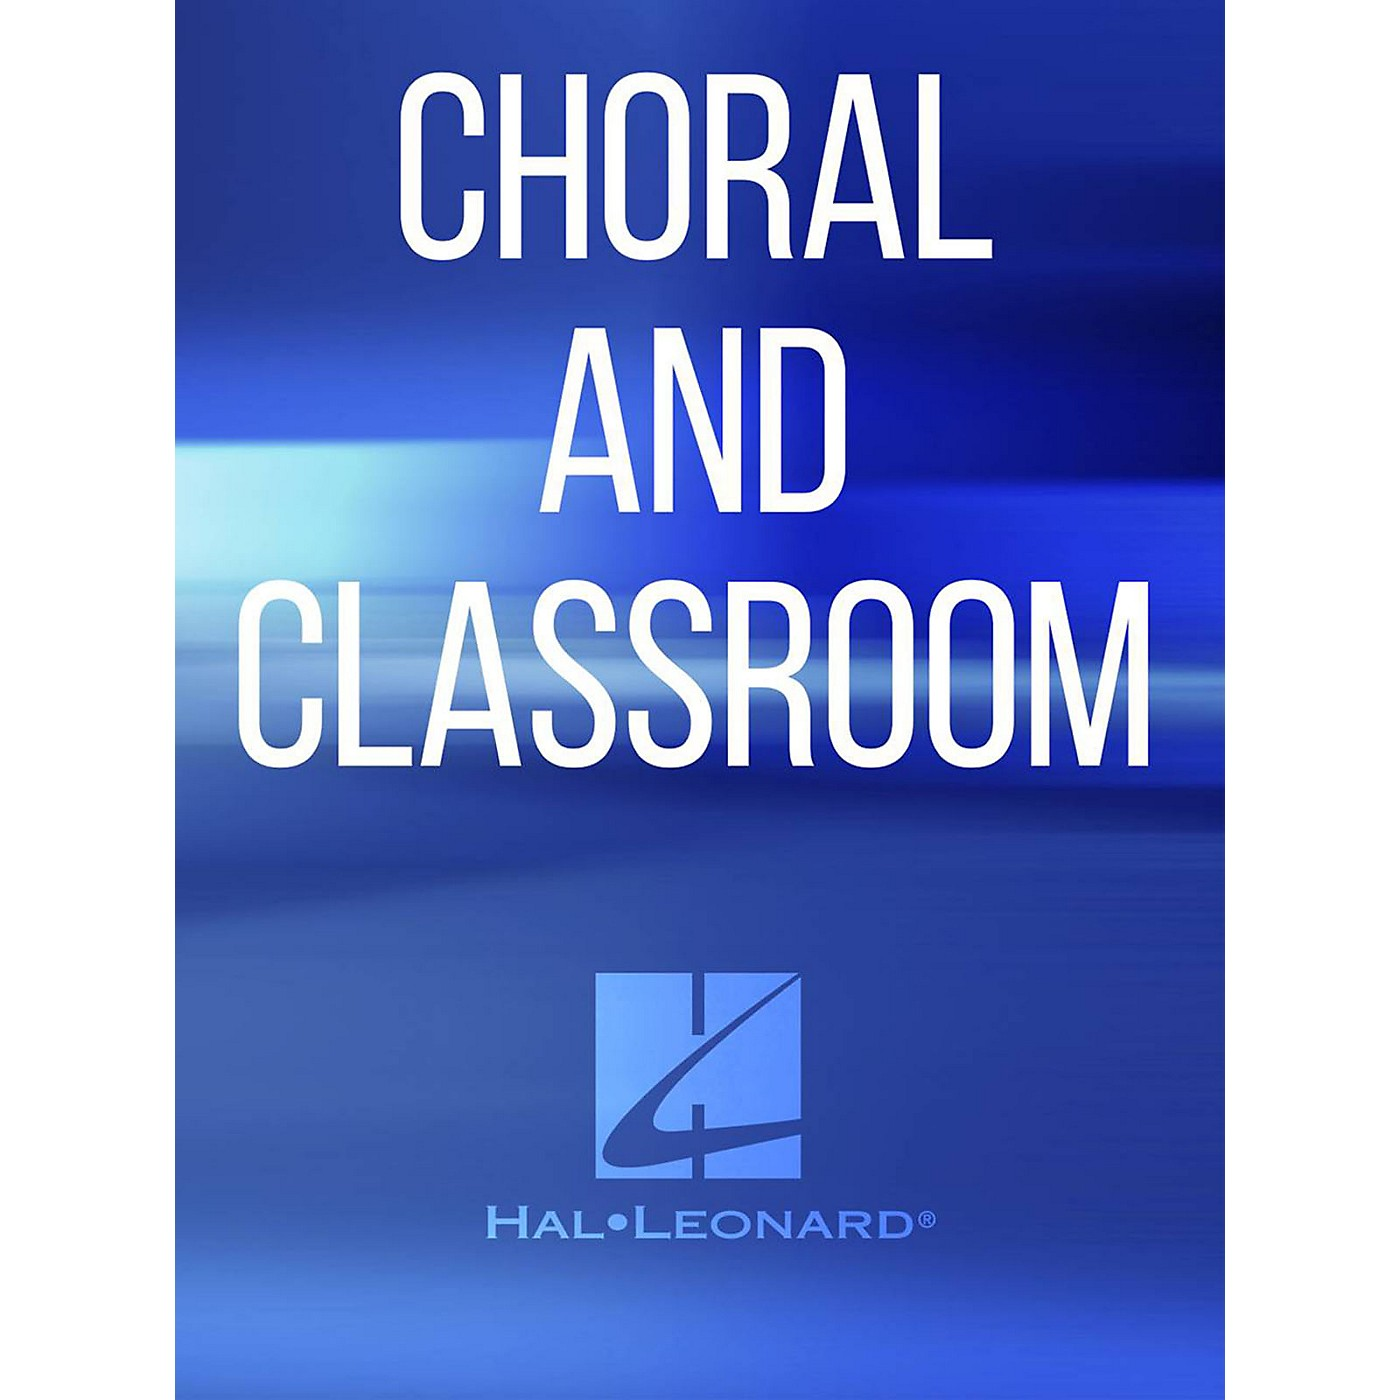 Hal Leonard Fanfare Fantasiw On Easter Hymn Organ Composed by Thomas Schmutzler thumbnail